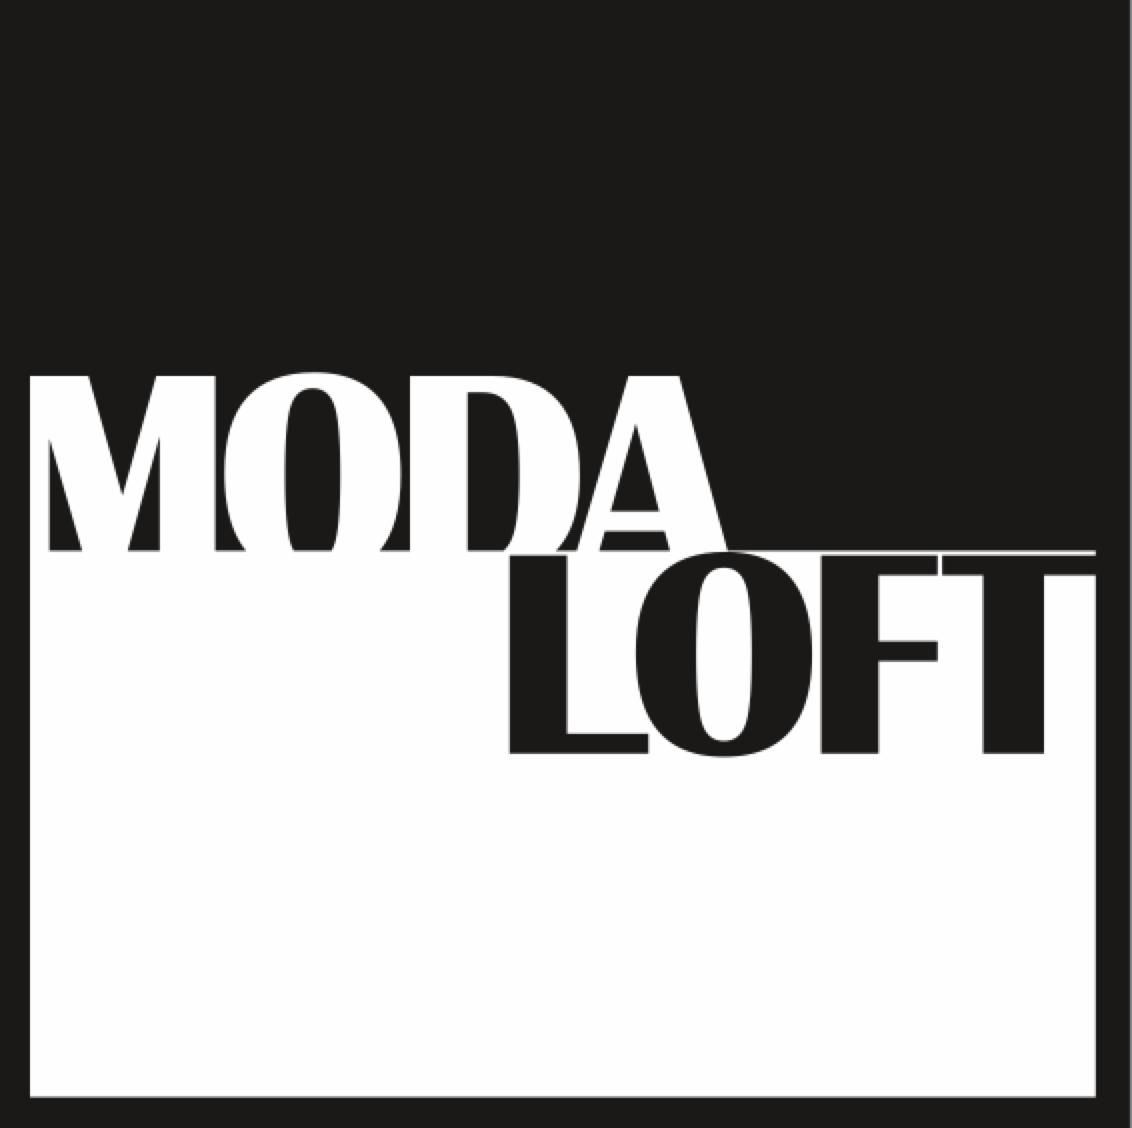 MODA LOFT(红星美凯龙徐州复兴商场)